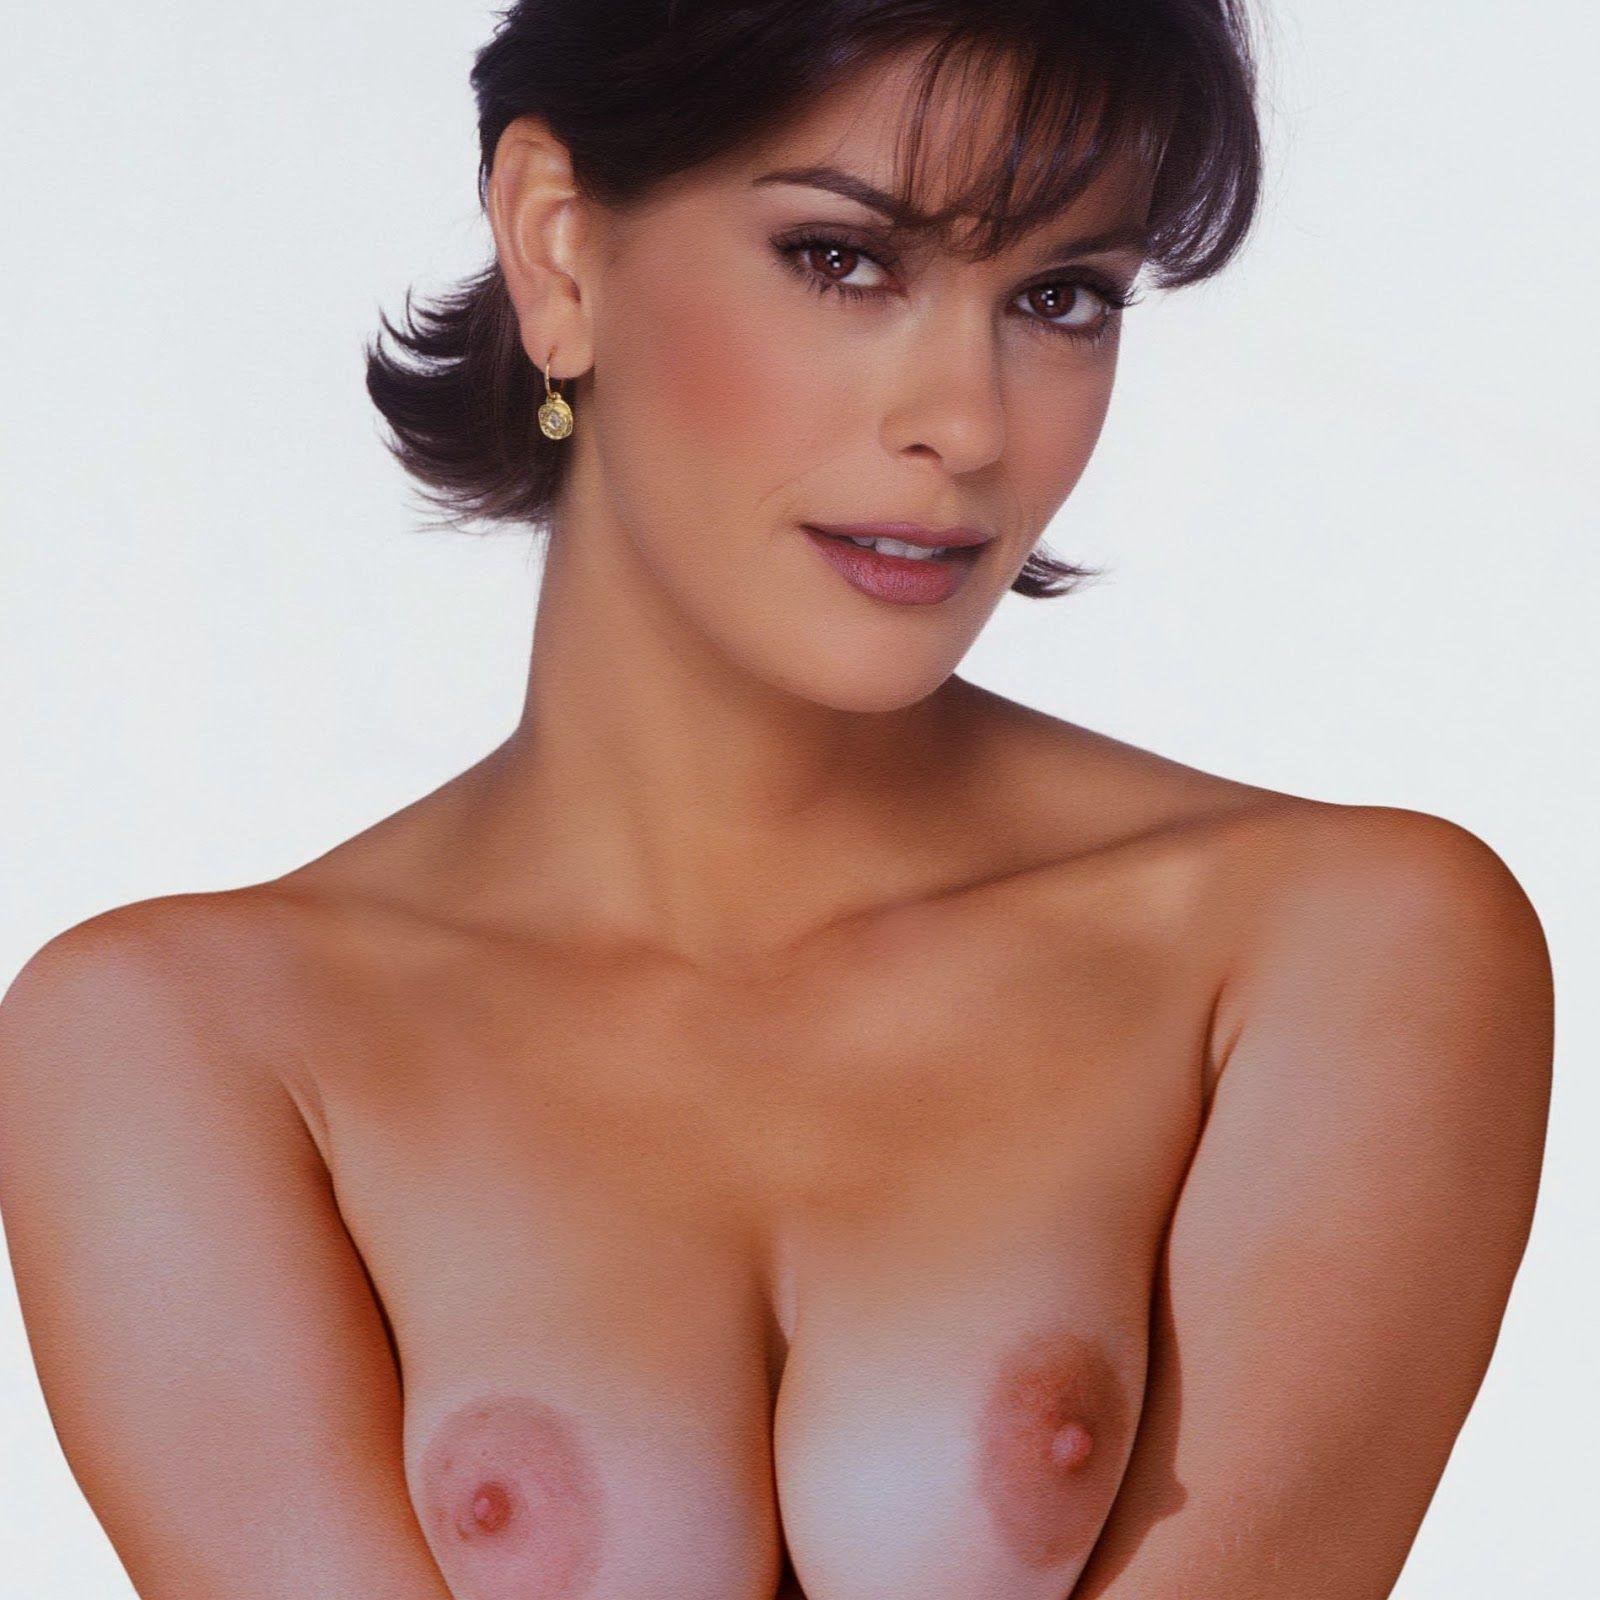 Have Naked teri hatcher nude